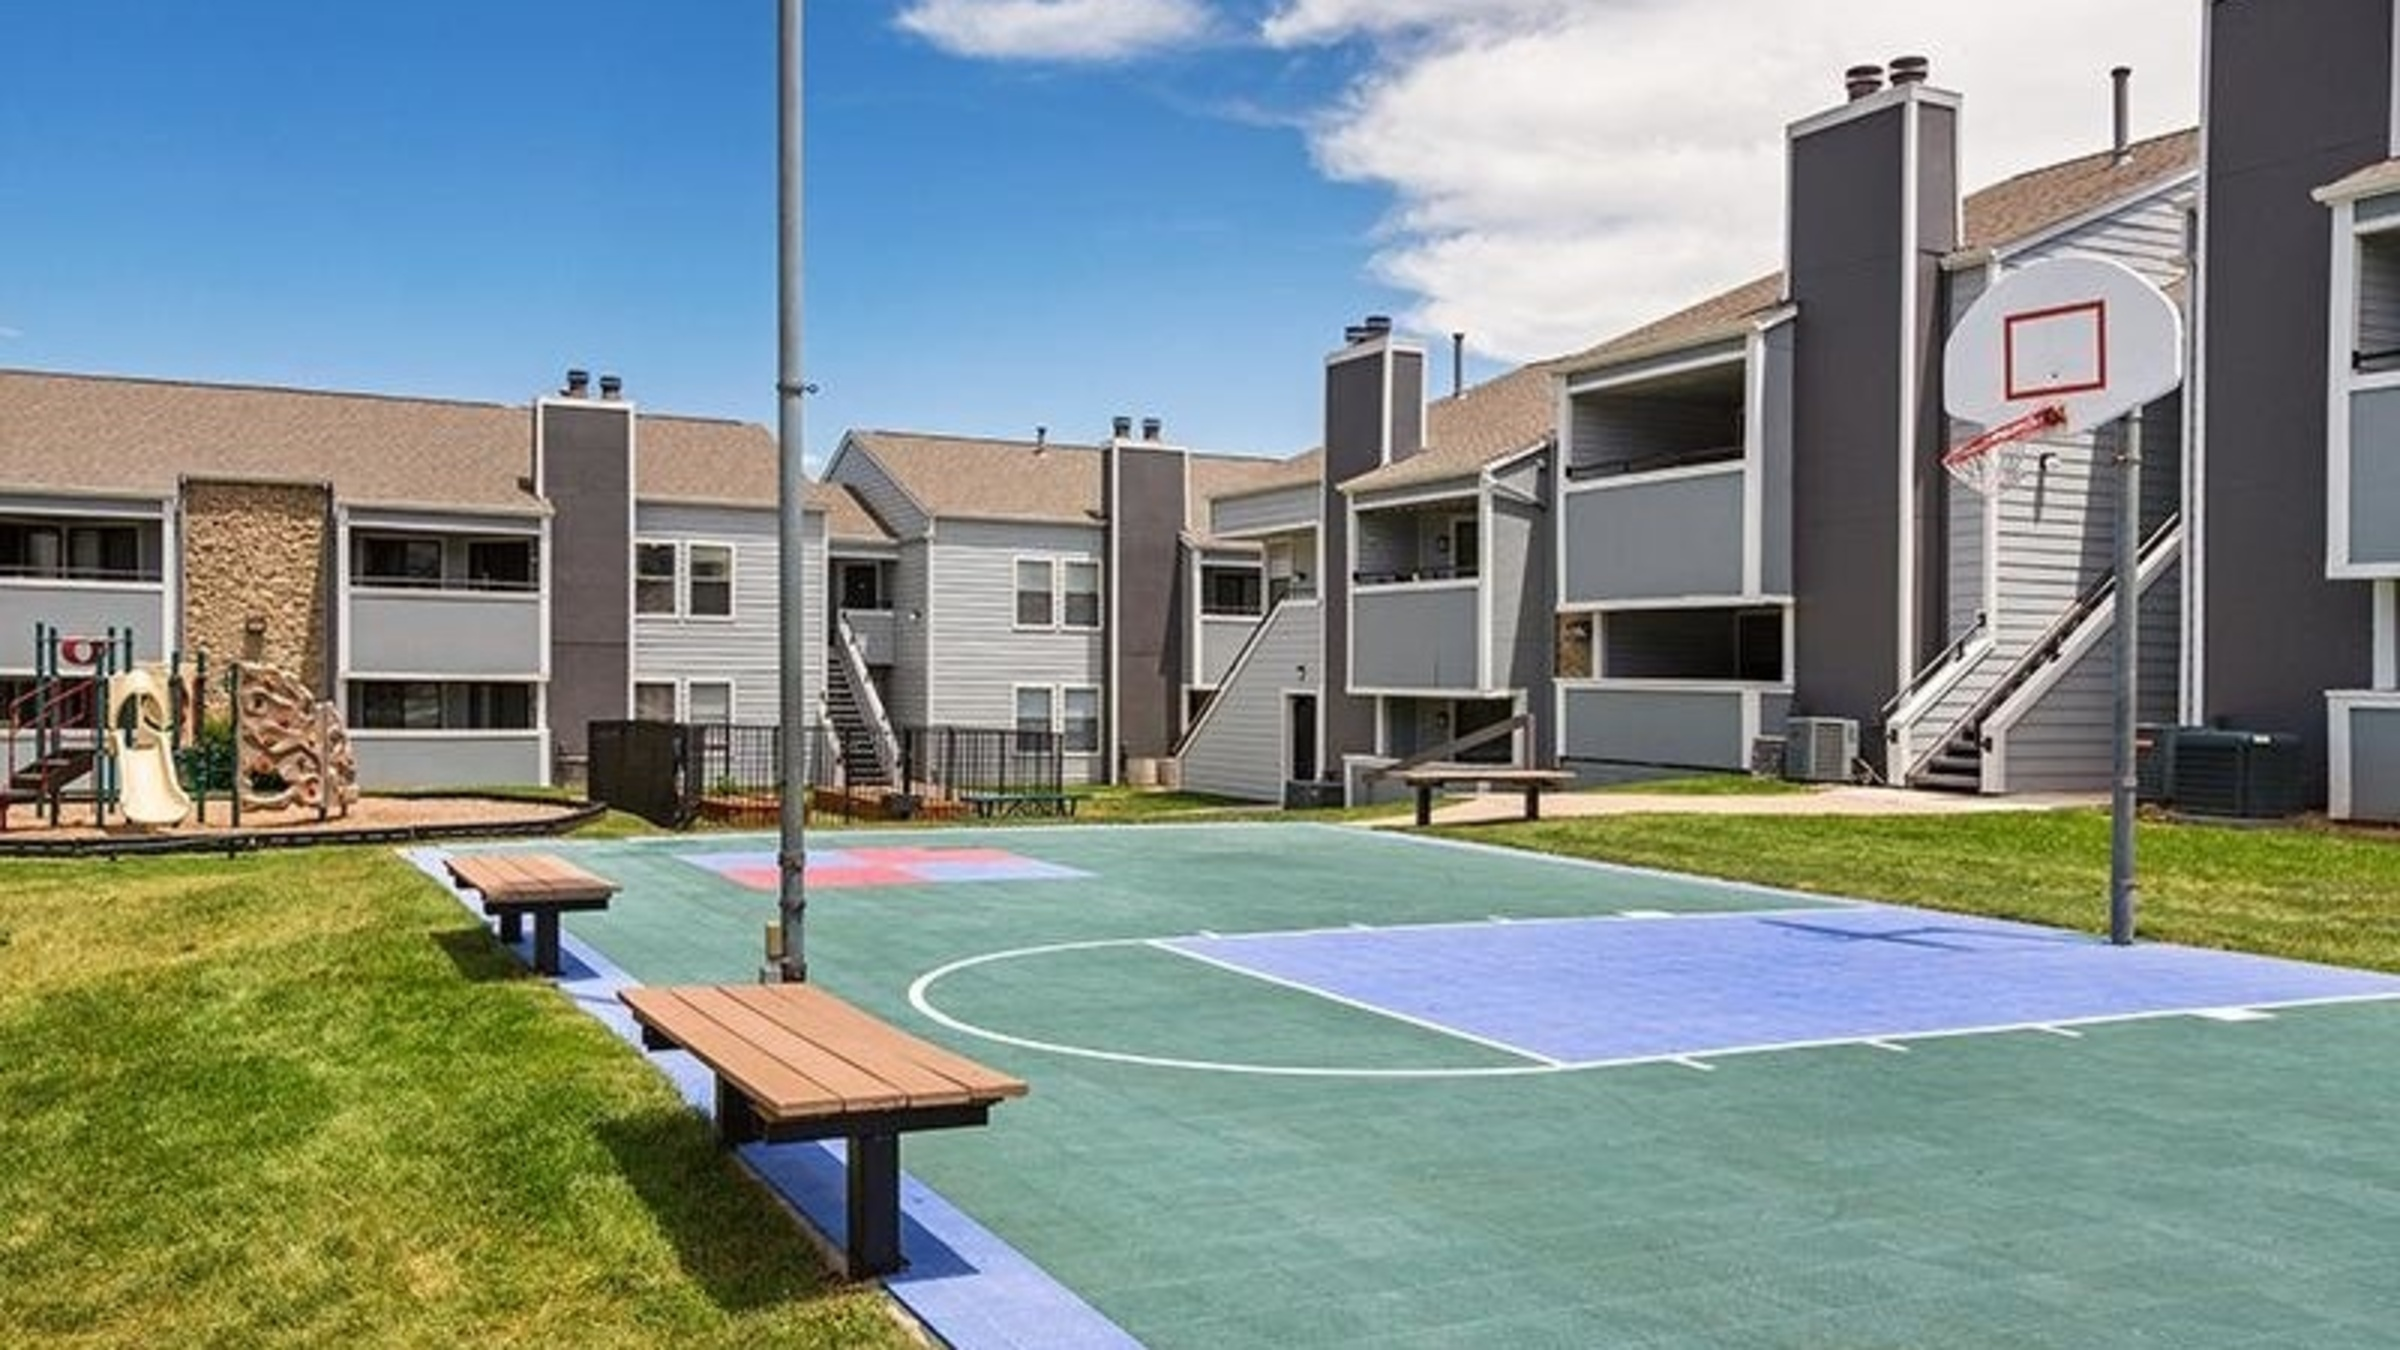 Landing Furnished Apartment Cheyenne Crest